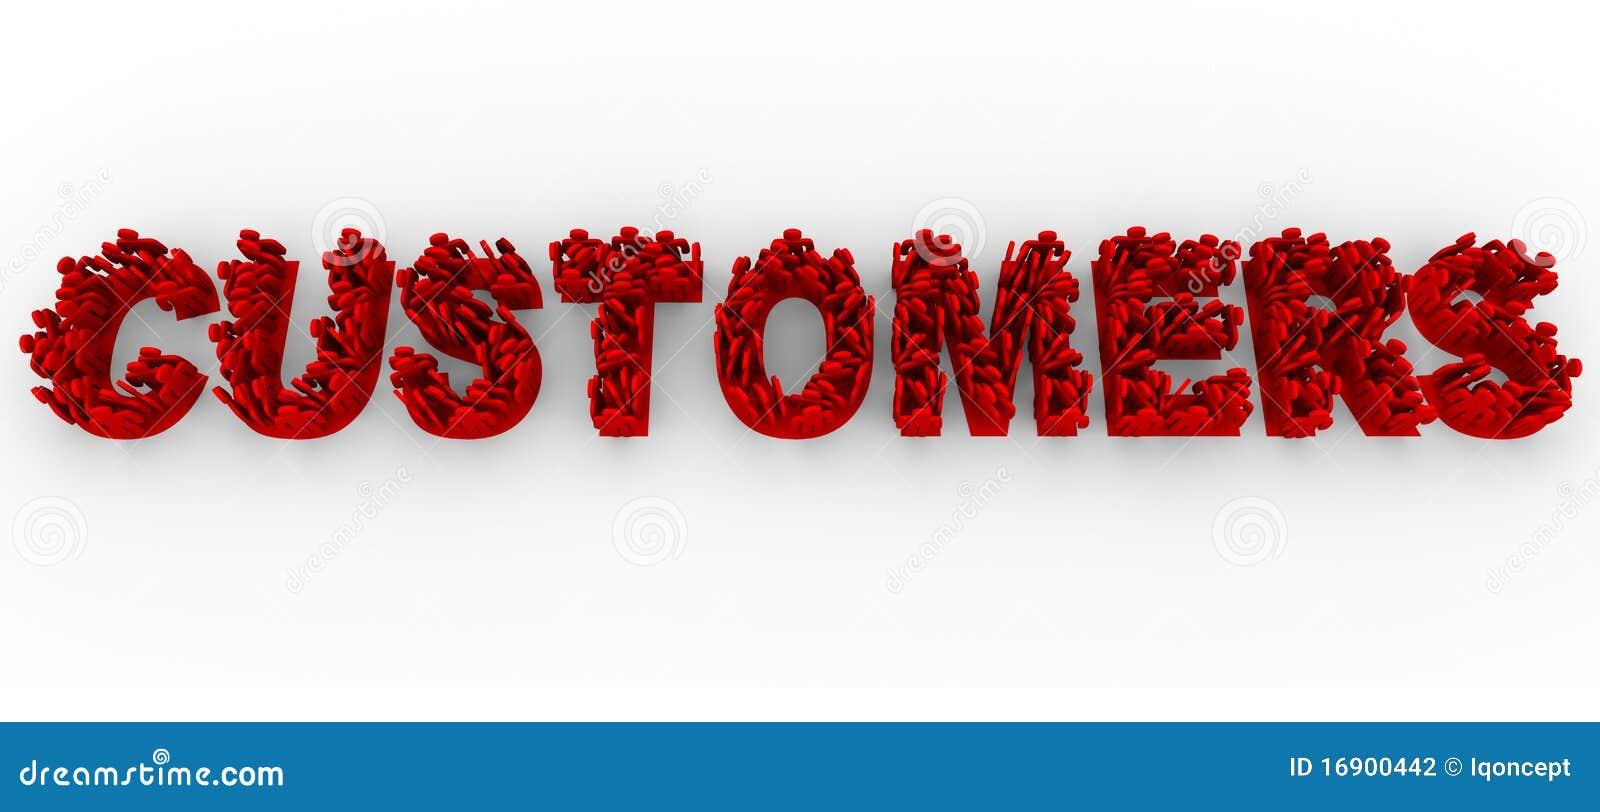 word customers letters form mensen vormen brieven klanten royalty stockfresh multe clientii litere formă oameni cuvant